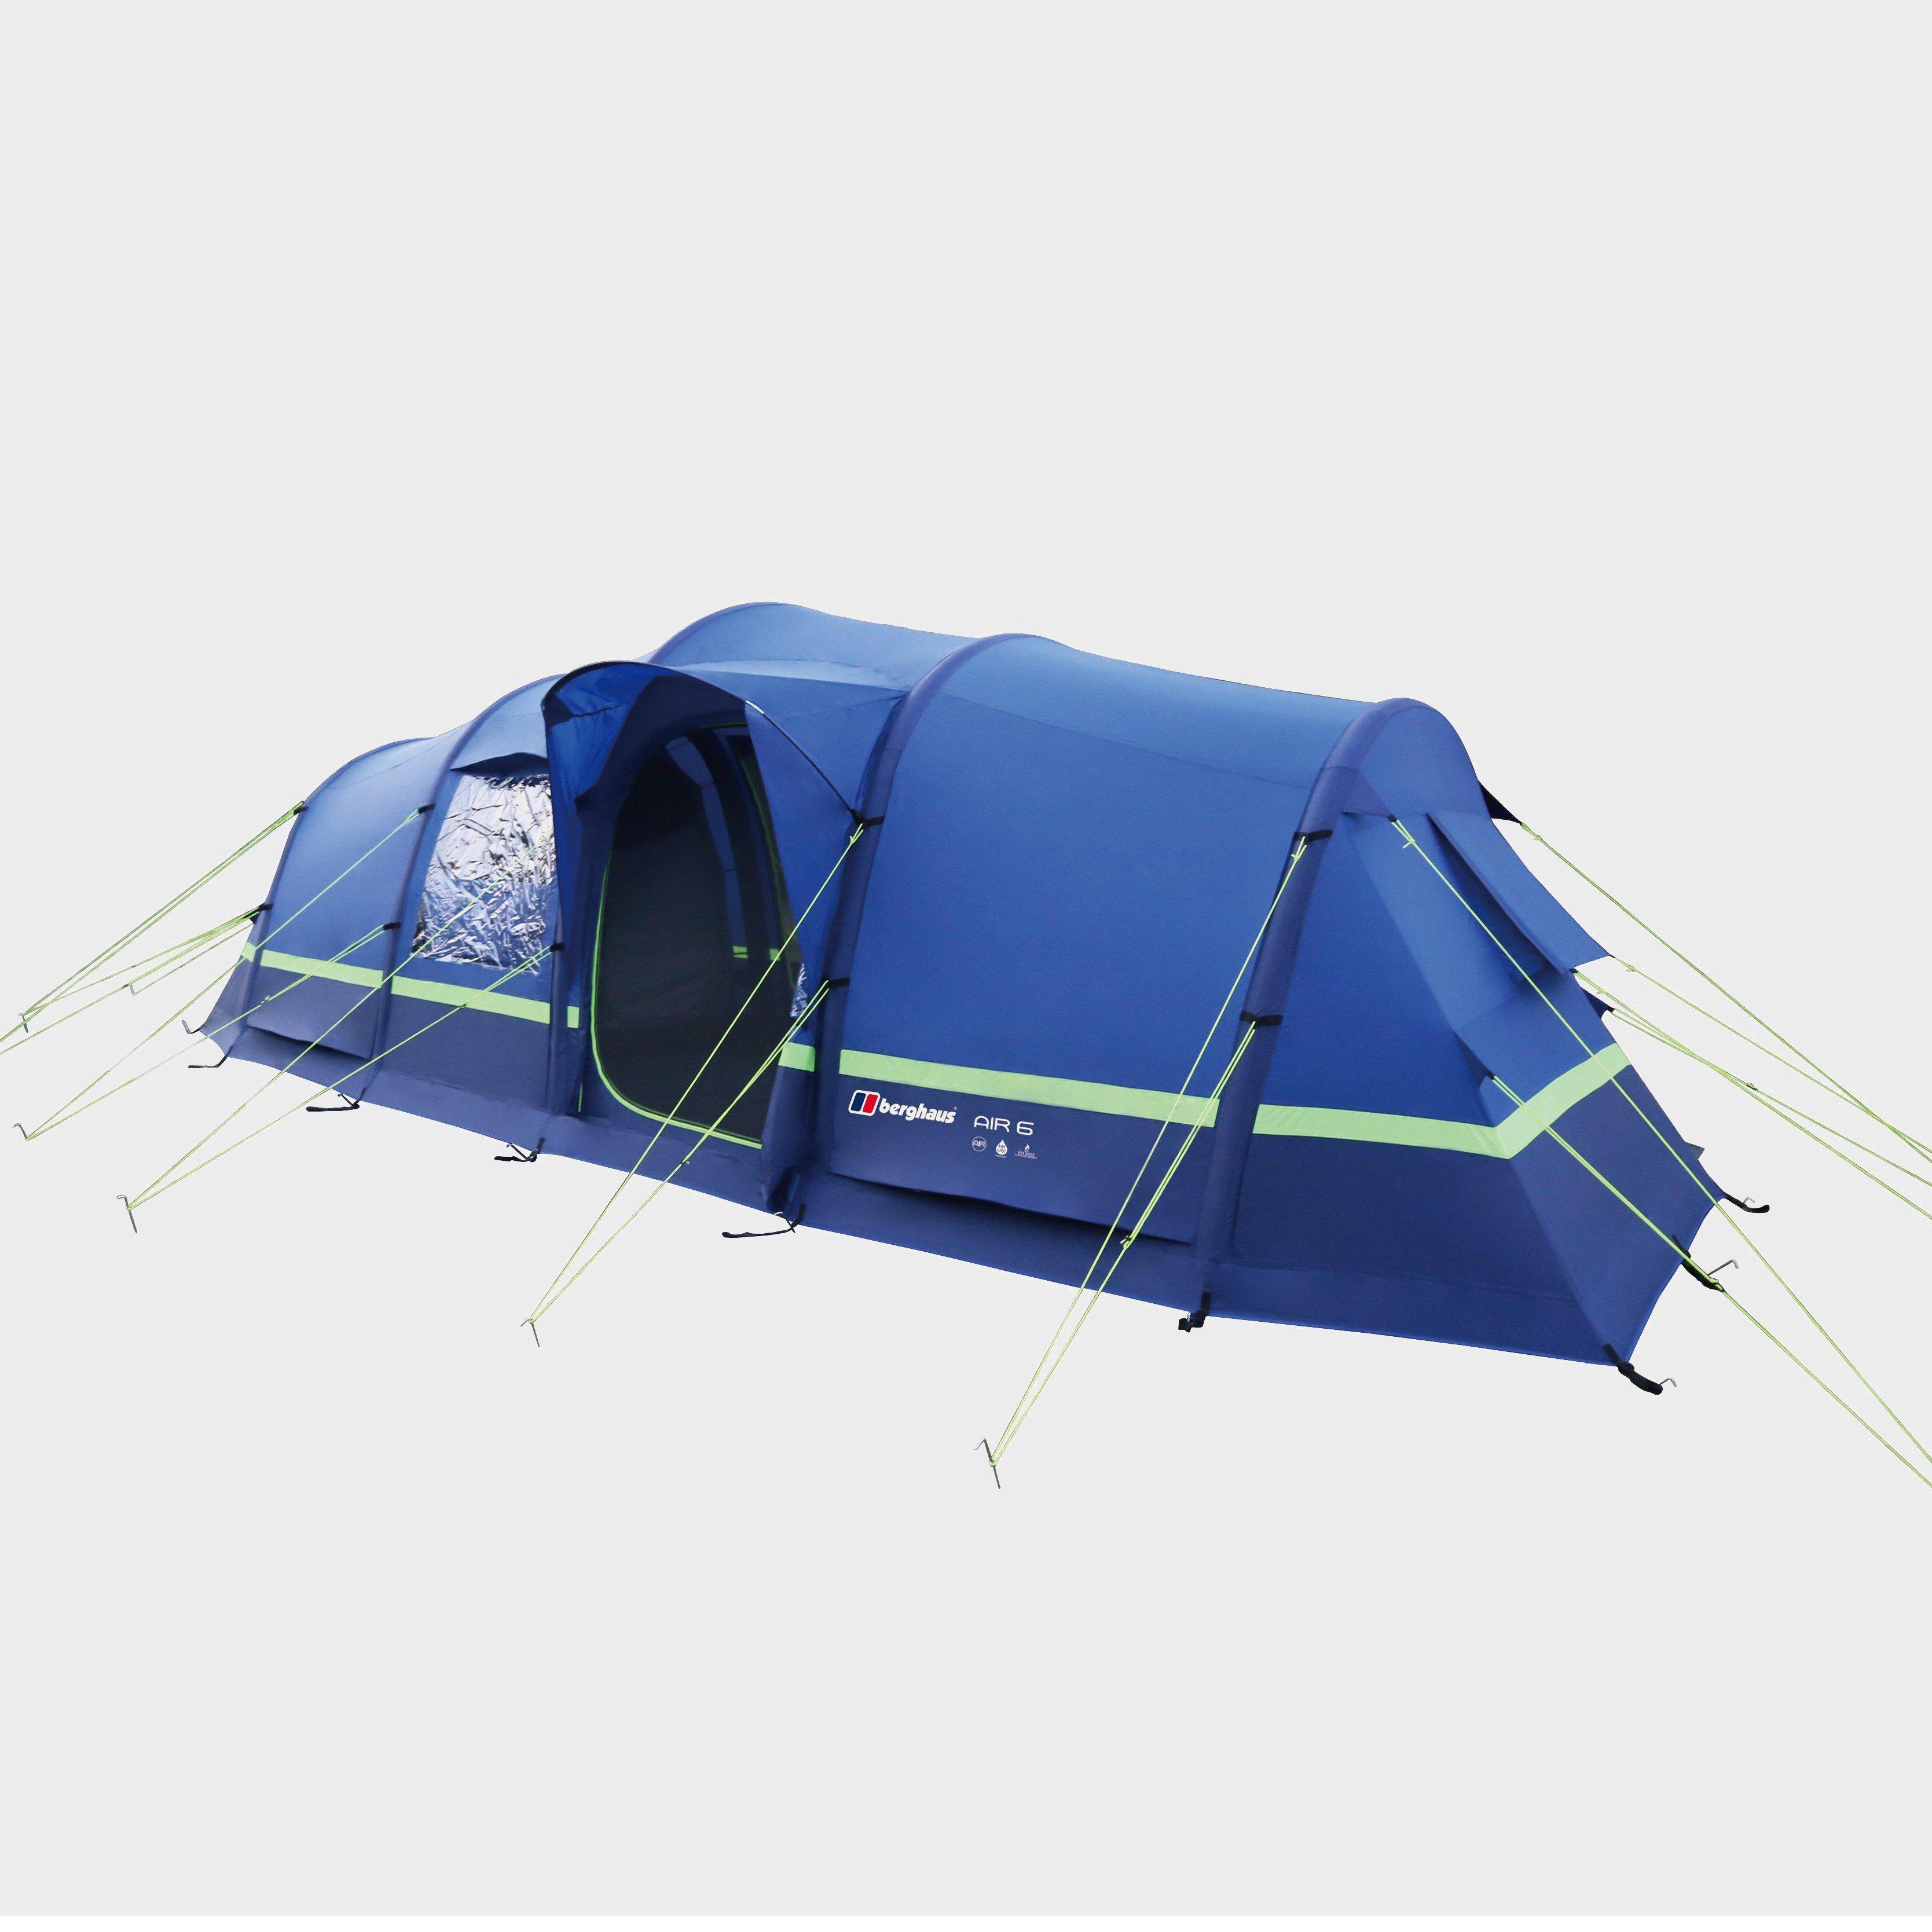 Air 6 Tent & Berghaus Air 6 Tent